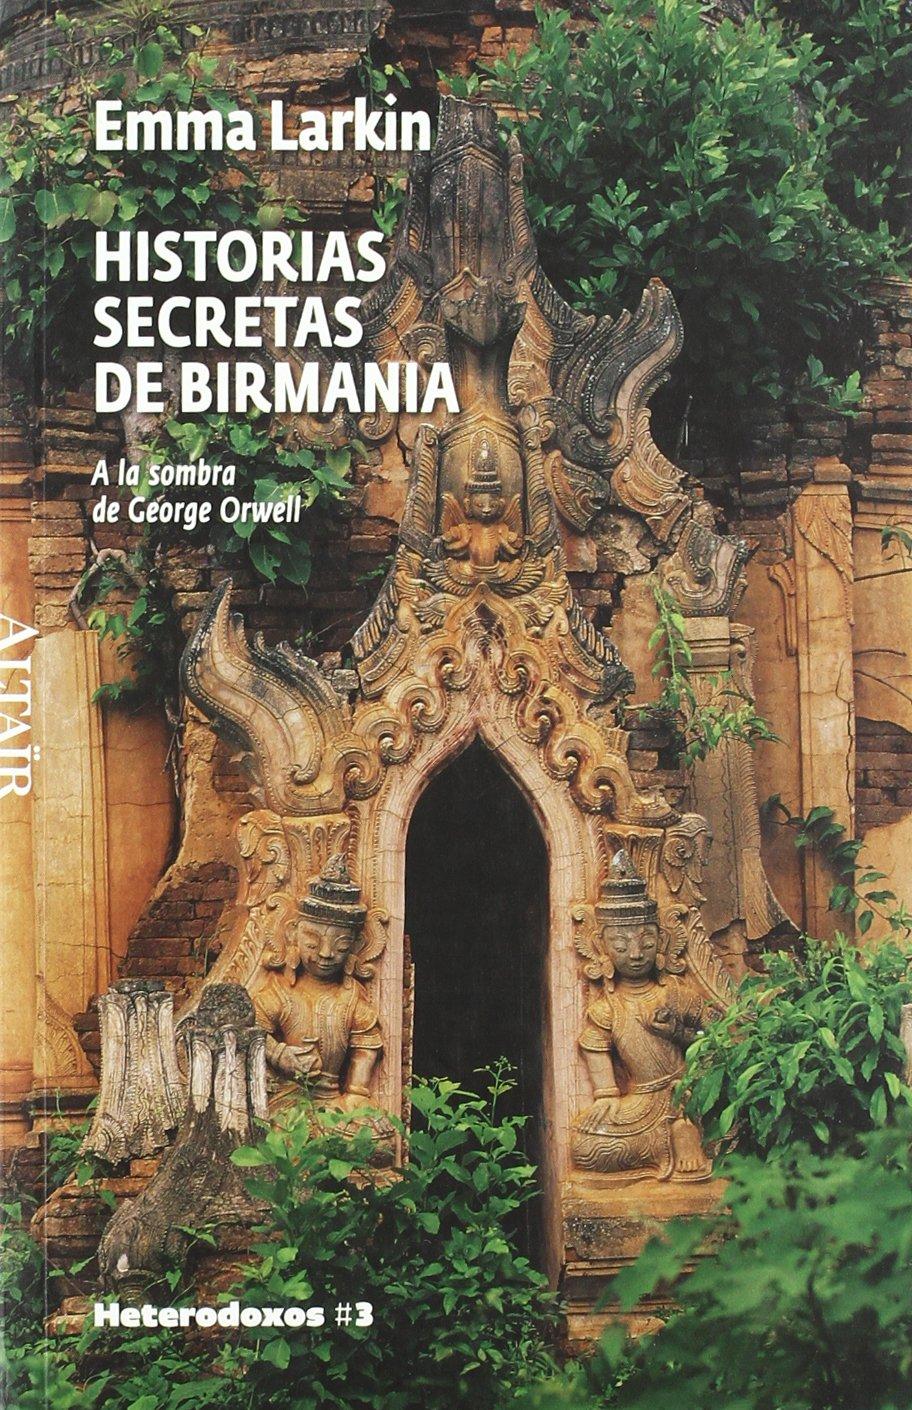 Historias secretas de Birmania A la sombra de George Orwell de Emma Larkin